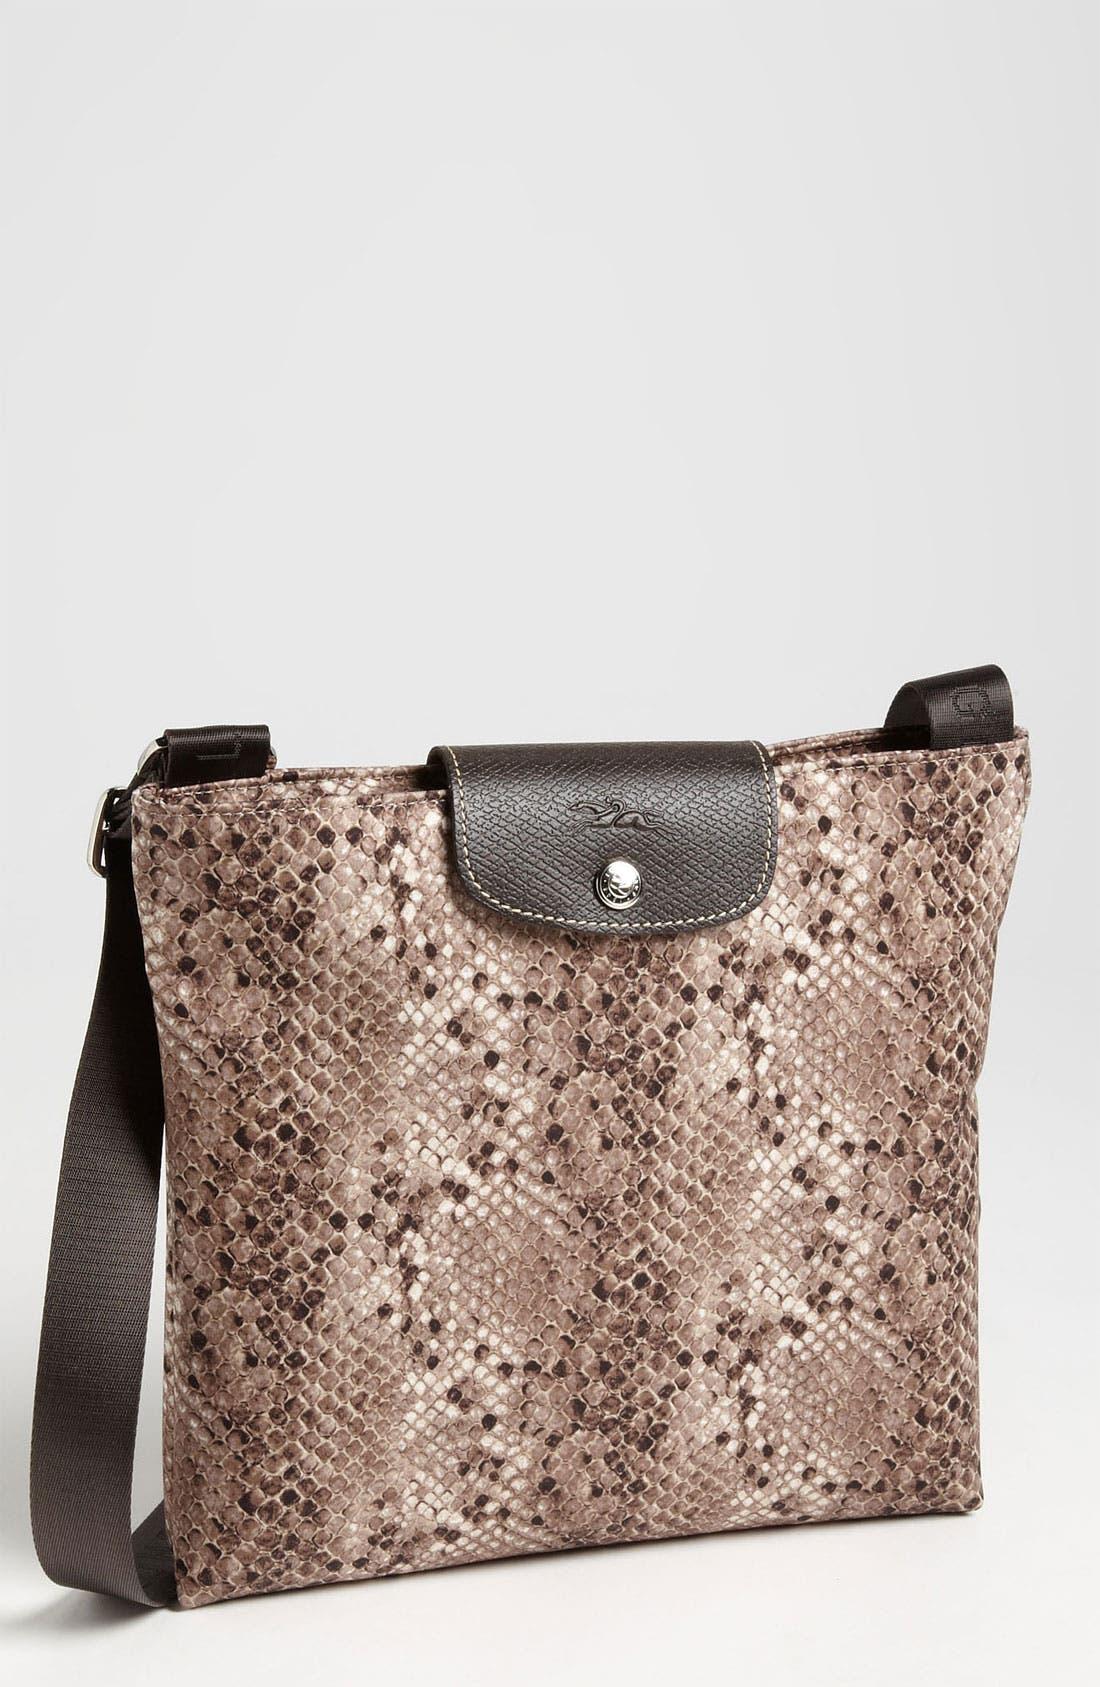 'Le Pliage' Python Print Crossbody Bag, Main, color, 266